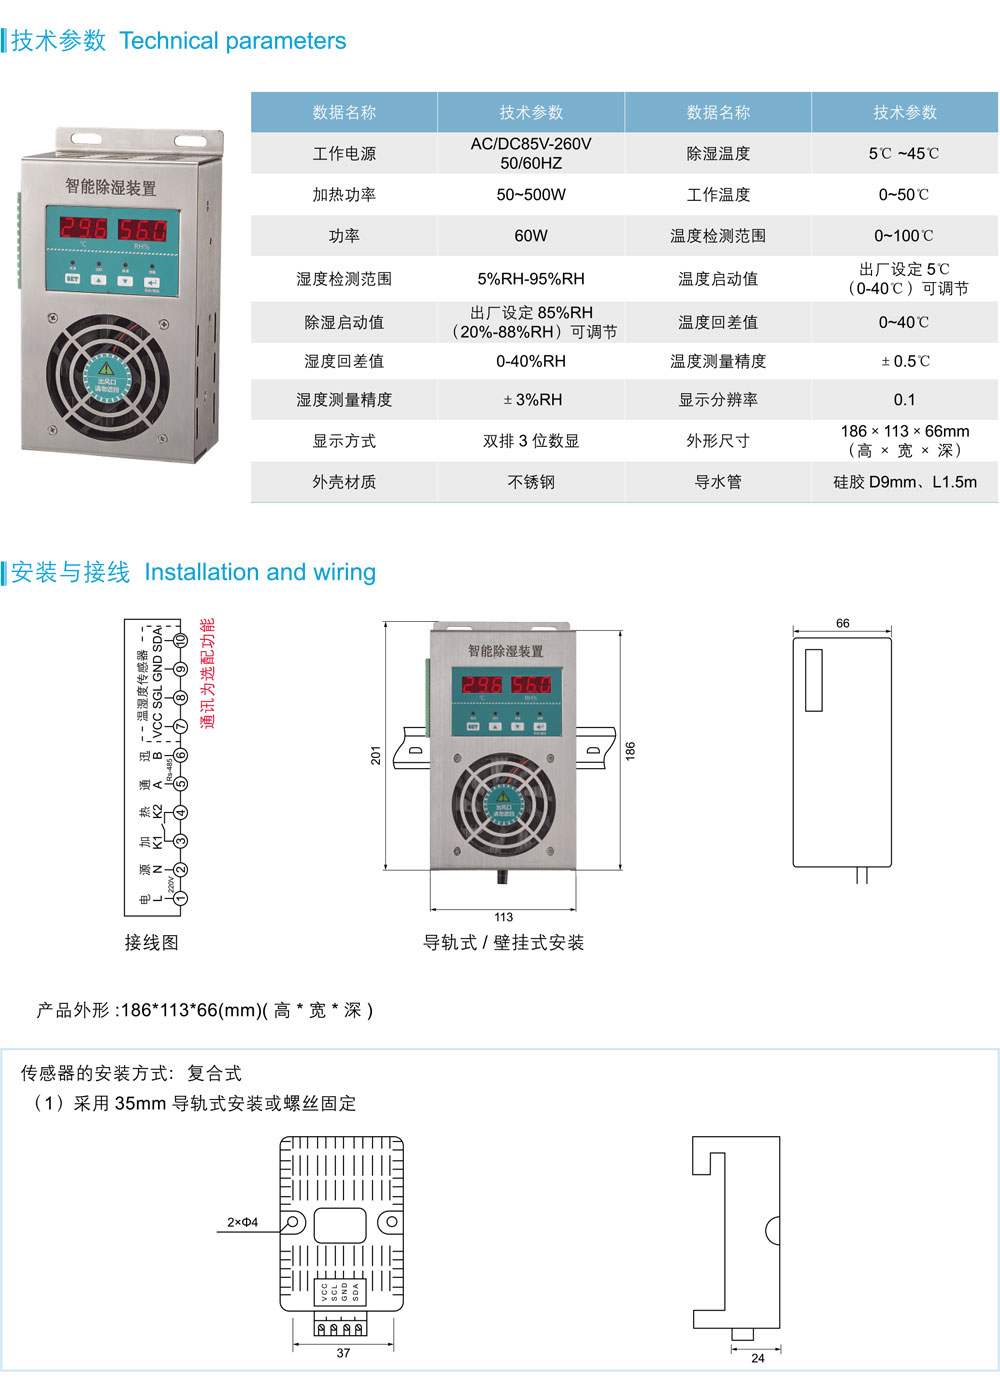 HXDZ-CS60X 不锈钢型智能除湿装置详情.jpg